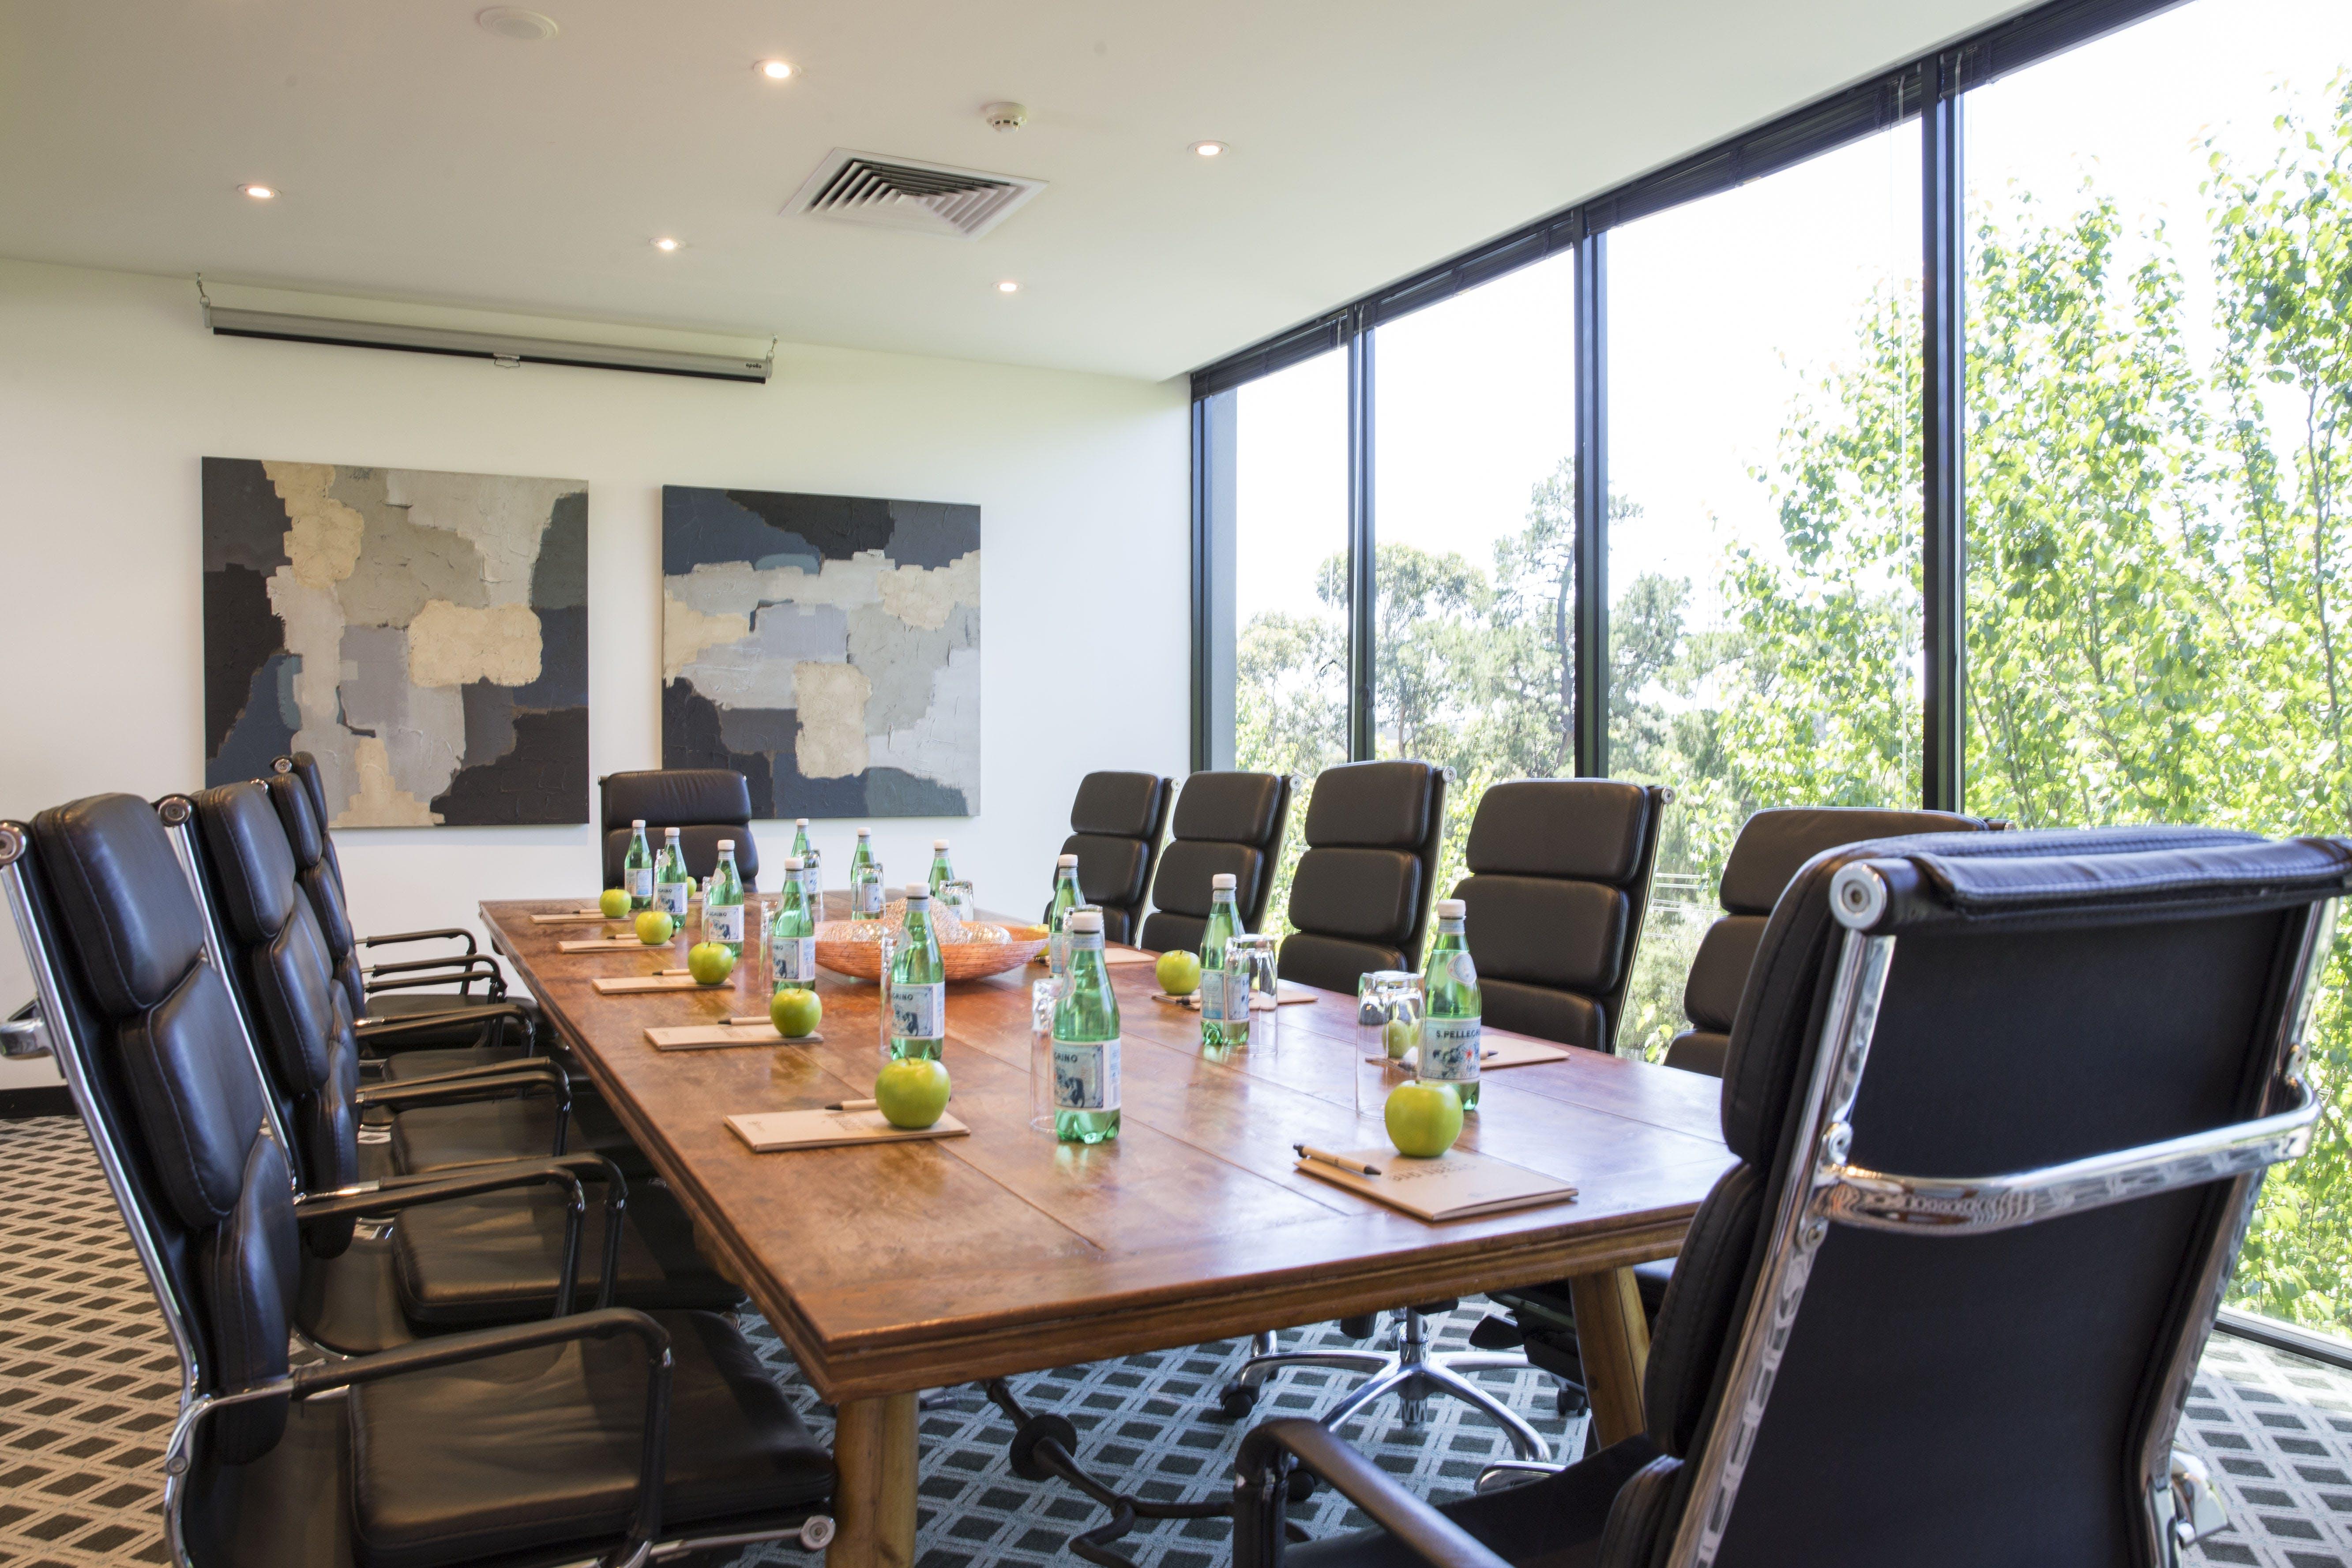 Executive Boardroom, meeting room at Toorak Corporate, image 1